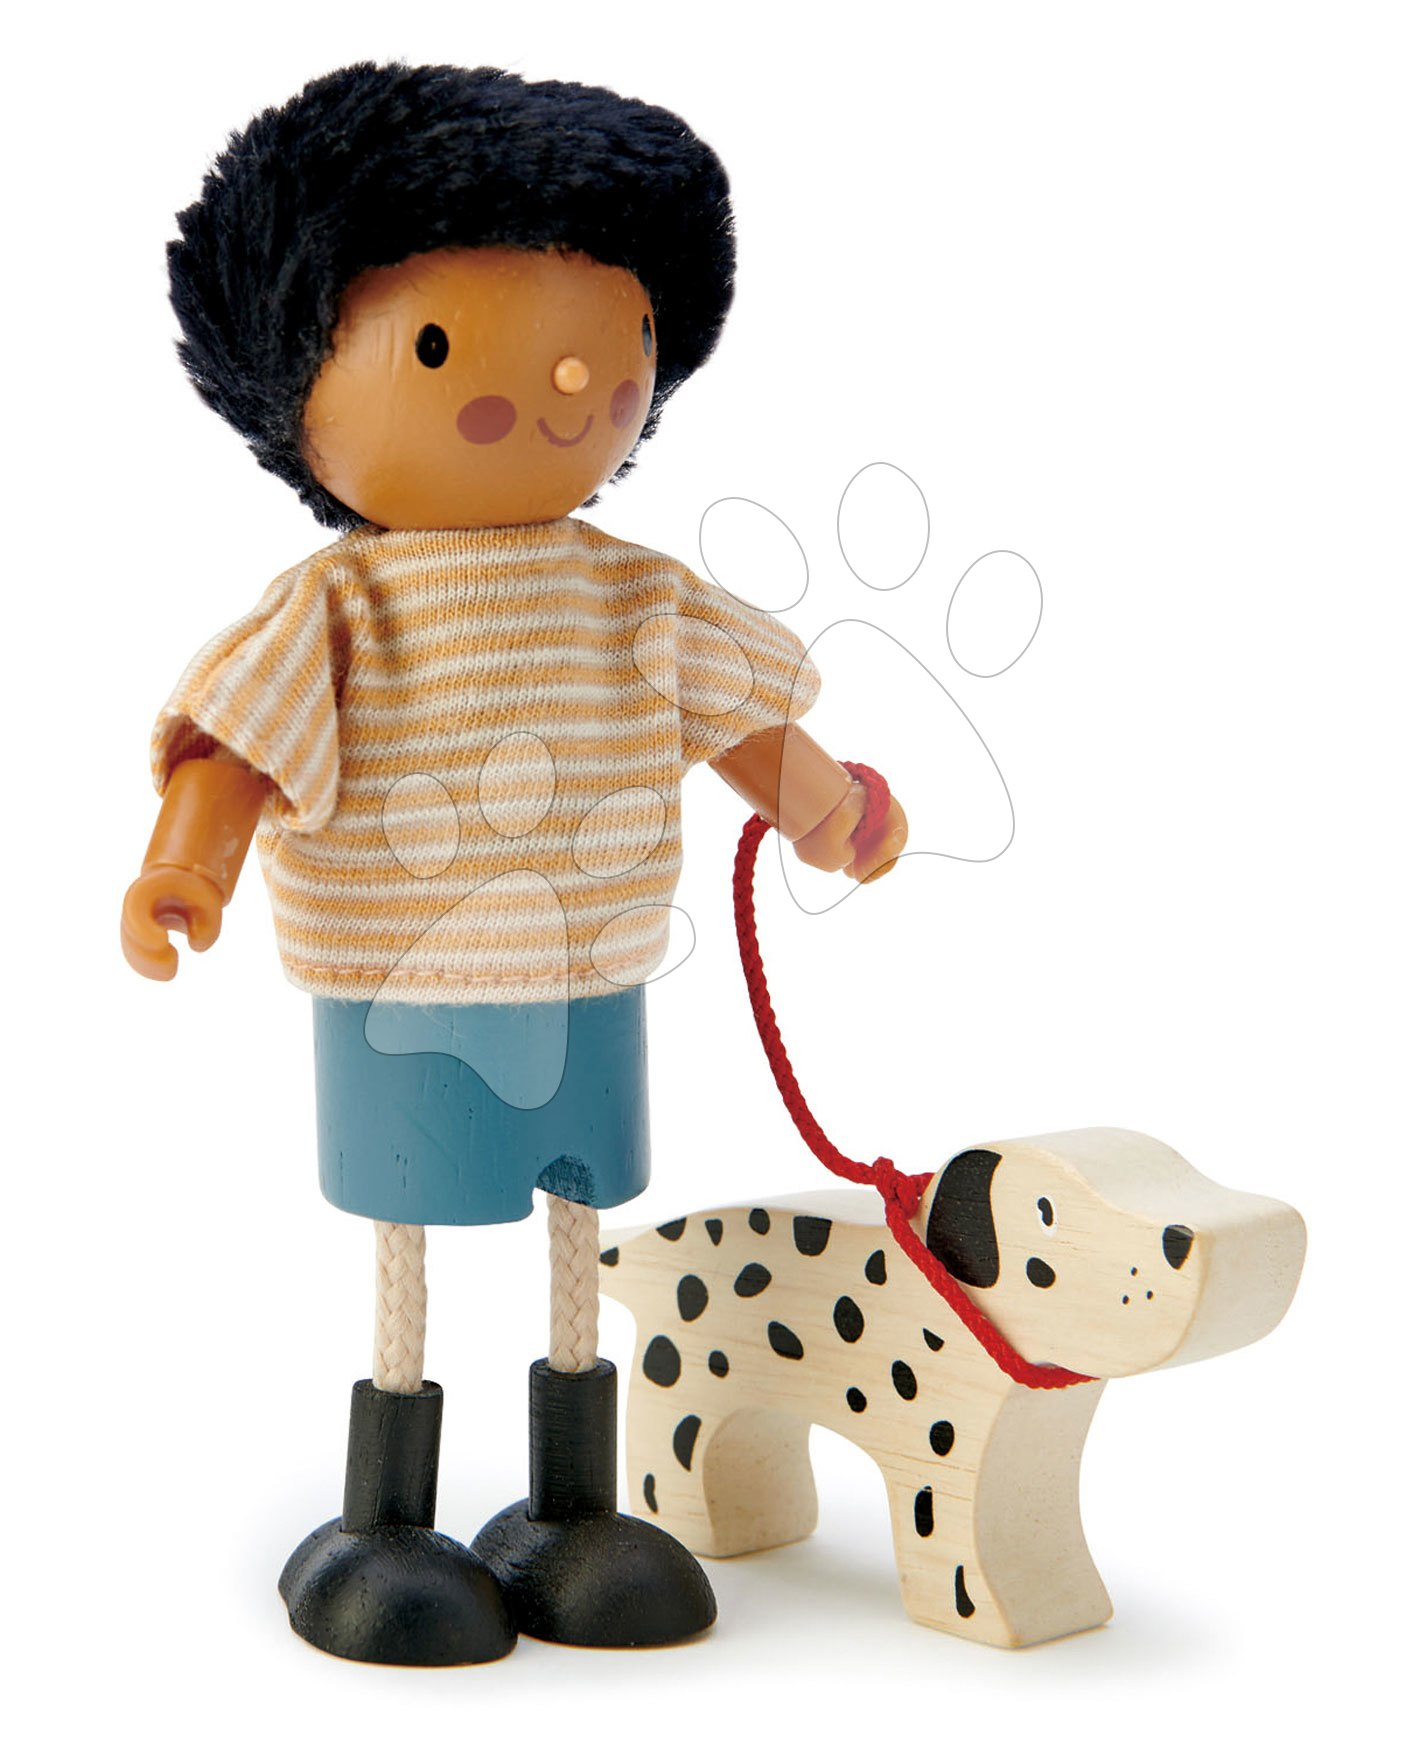 Fa babaházak  - Fa figura kutyussal Mr. Forrester Tender Leaf Toys csikos trikóban